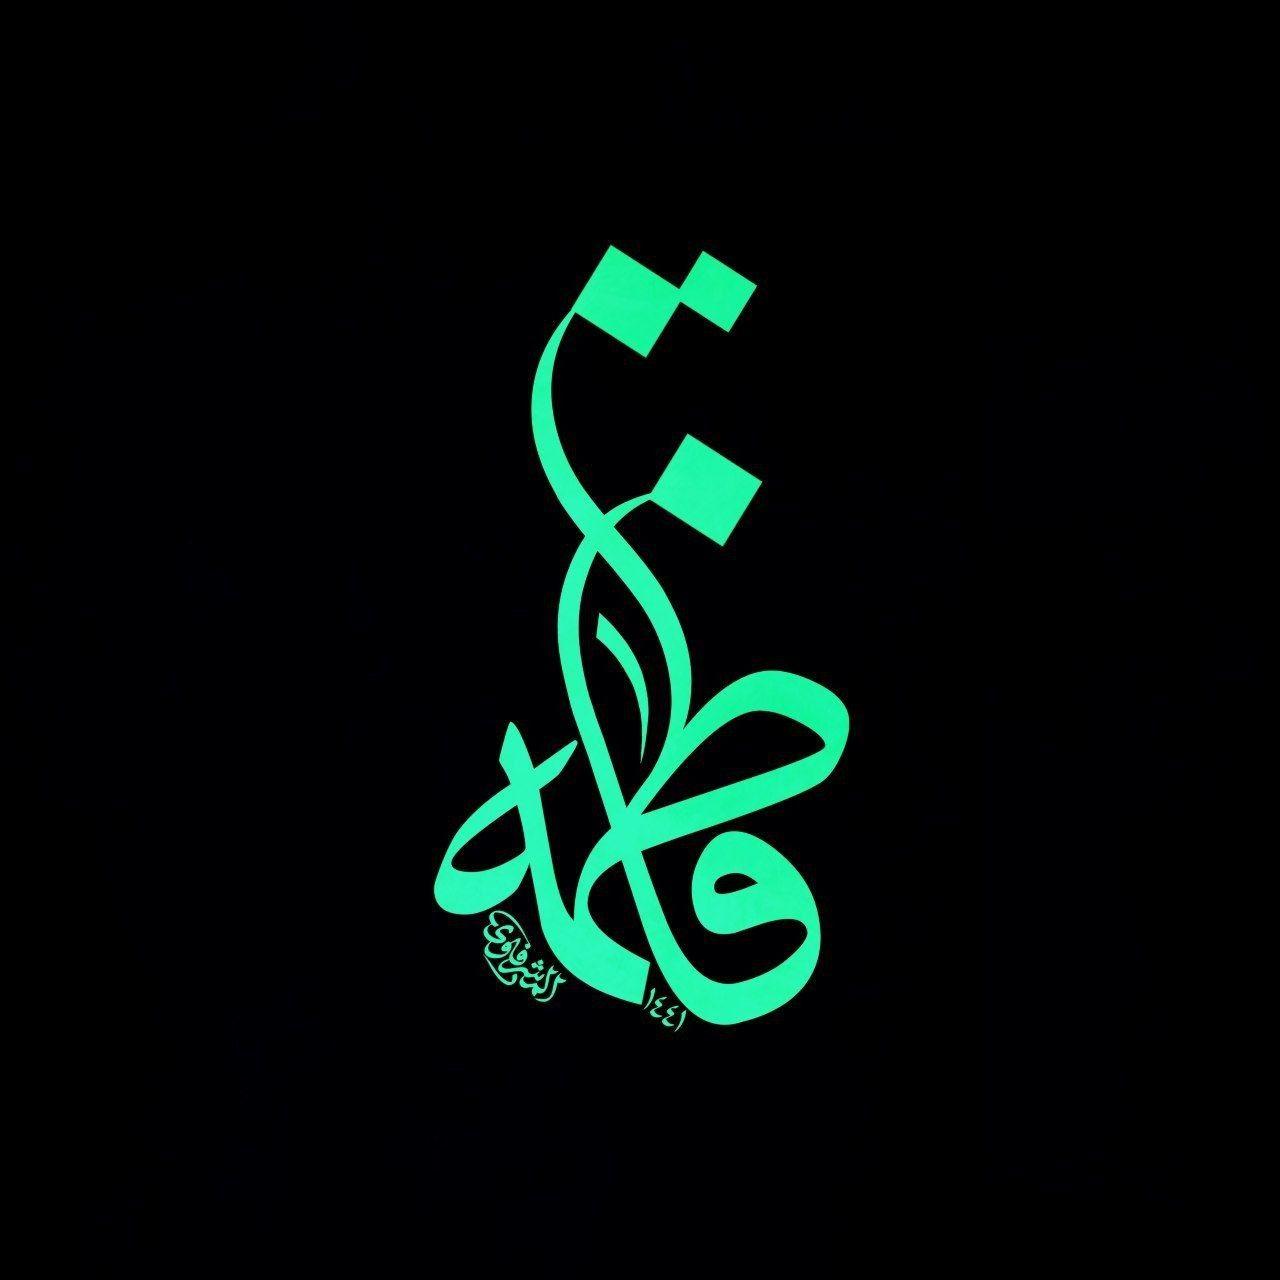 فاطمة عليها السلام Arabic Calligraphy Design Canvas Painting Designs Calligraphy Name